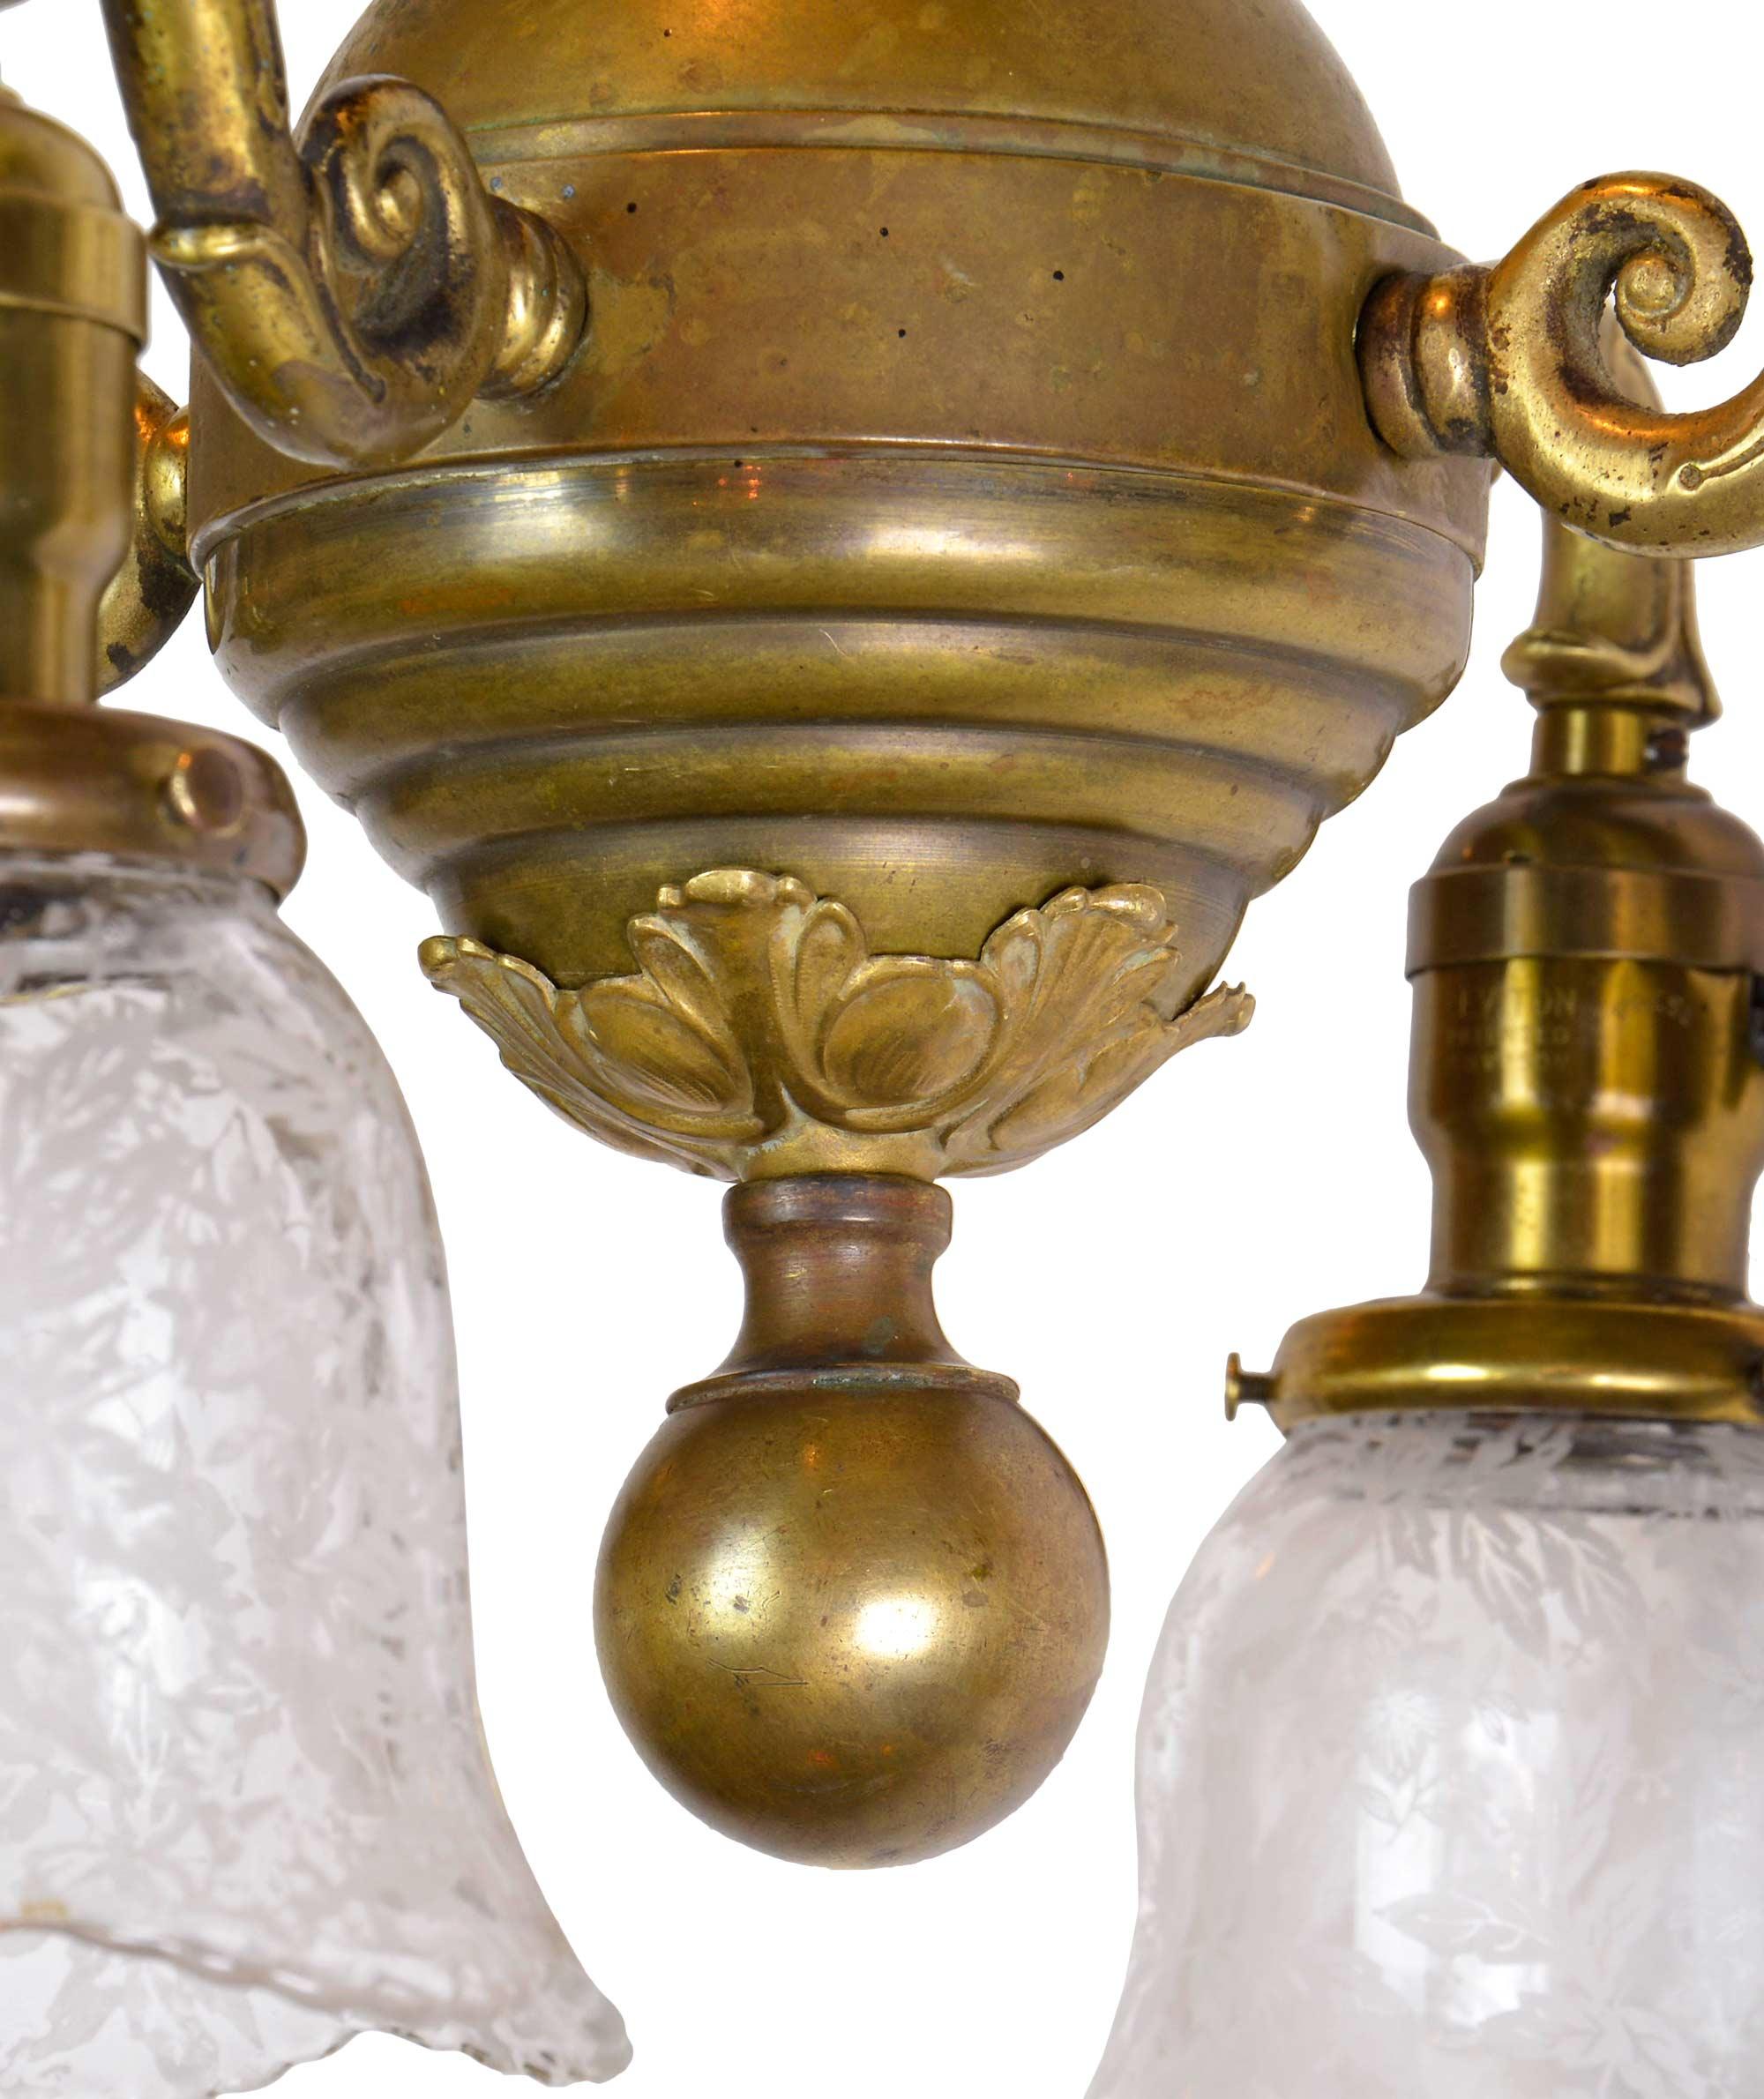 46658-victorian-4-arm-brass-chandelier-finial.jpg